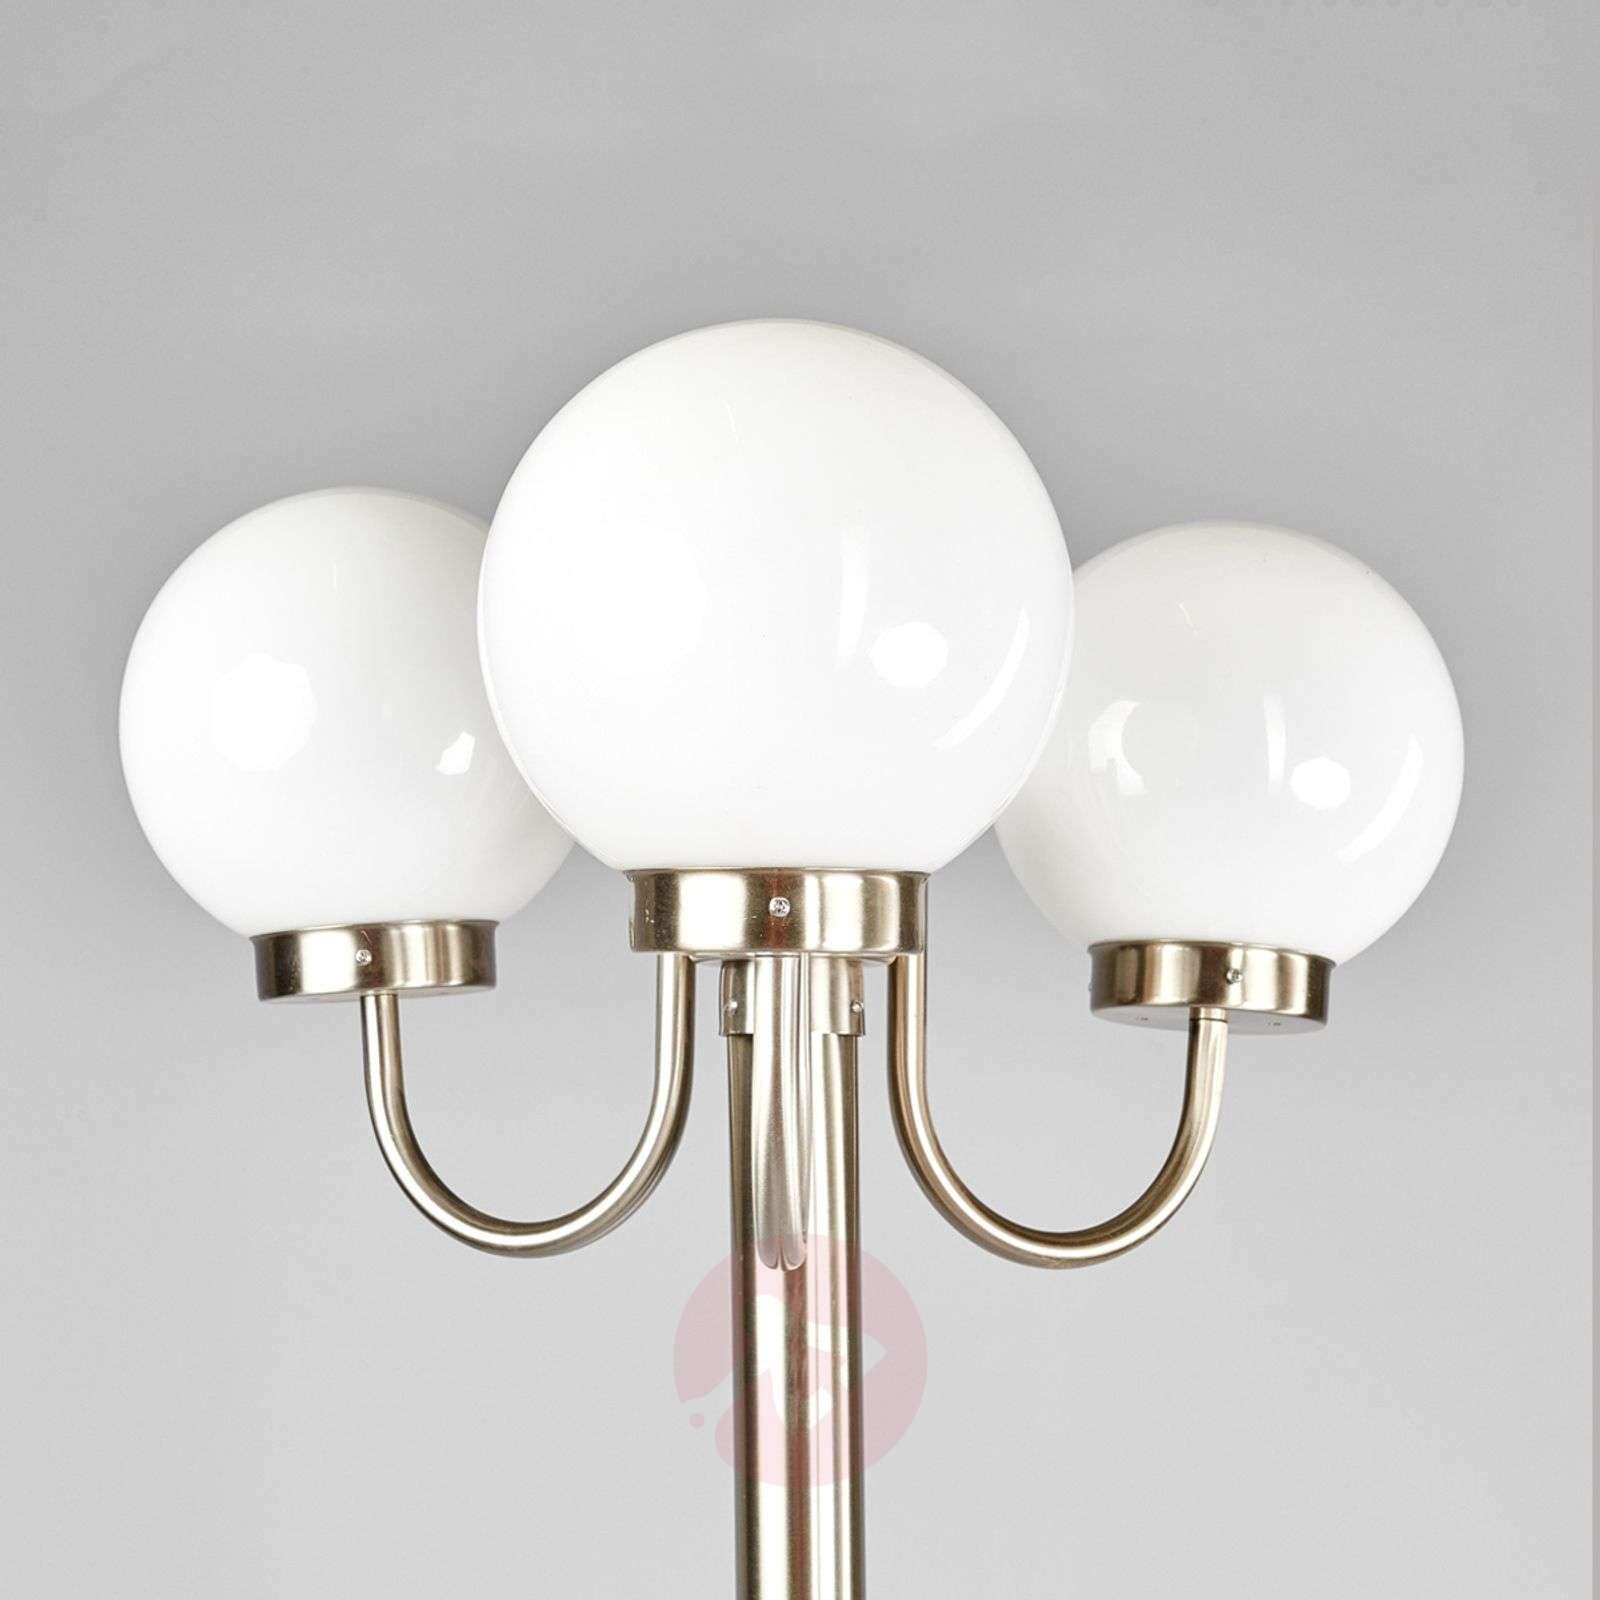 3 light post light laci made of stainless steel lights 3 light post light laci made of stainless steel 9647037 01 aloadofball Gallery